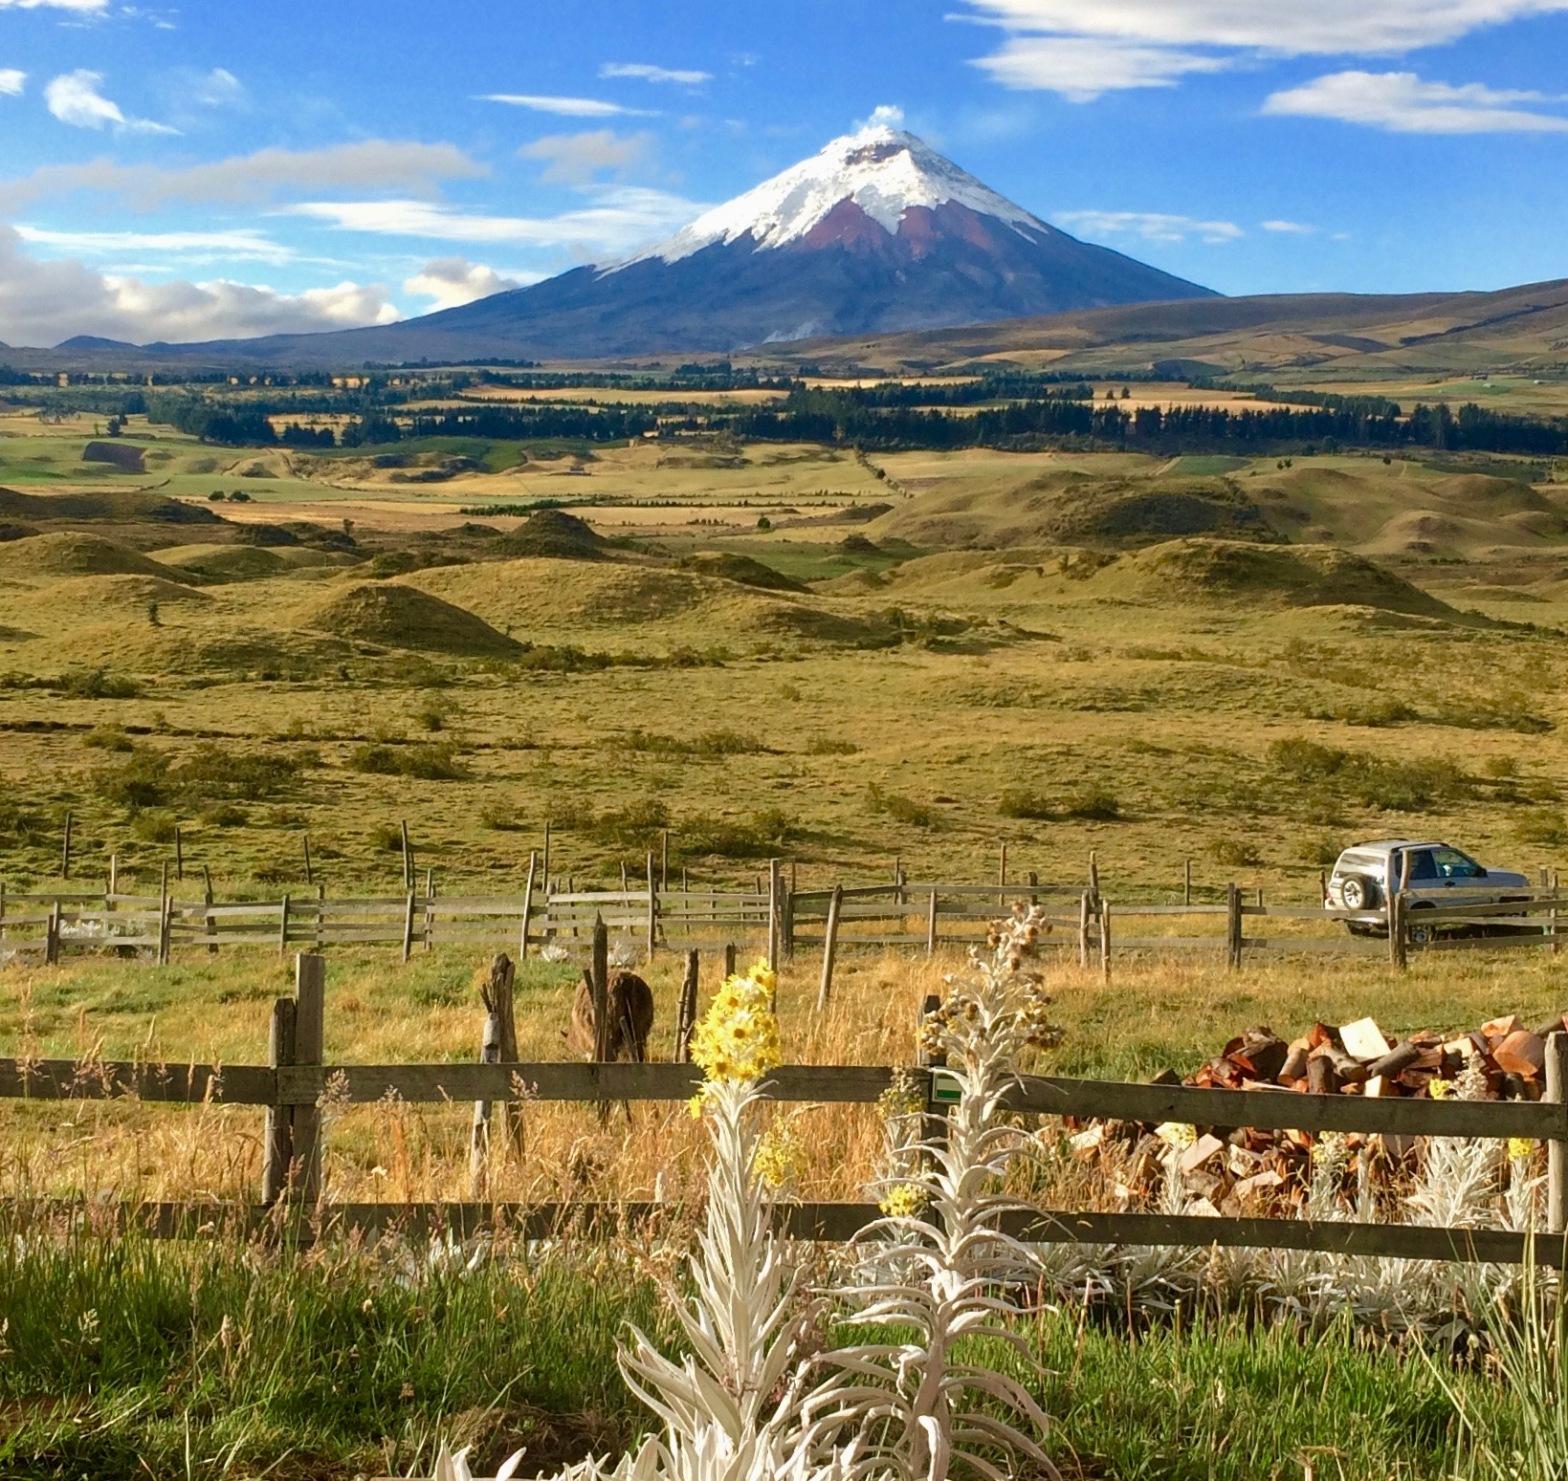 A view of Cotopaxi volcano in the Ecuadorian Andes